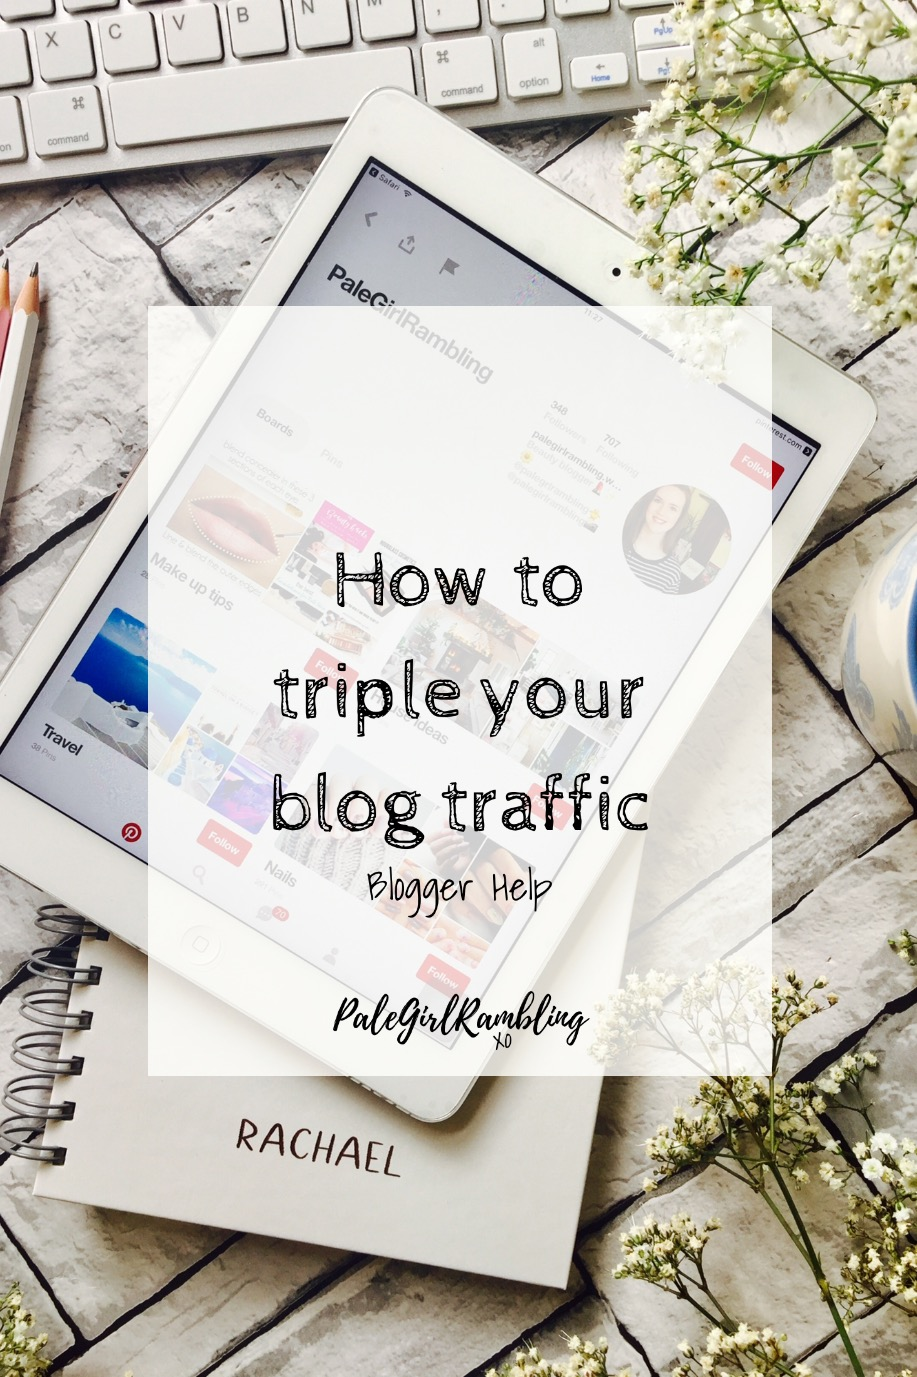 Pinterest blogger Help secret images graphics triple blog traffic